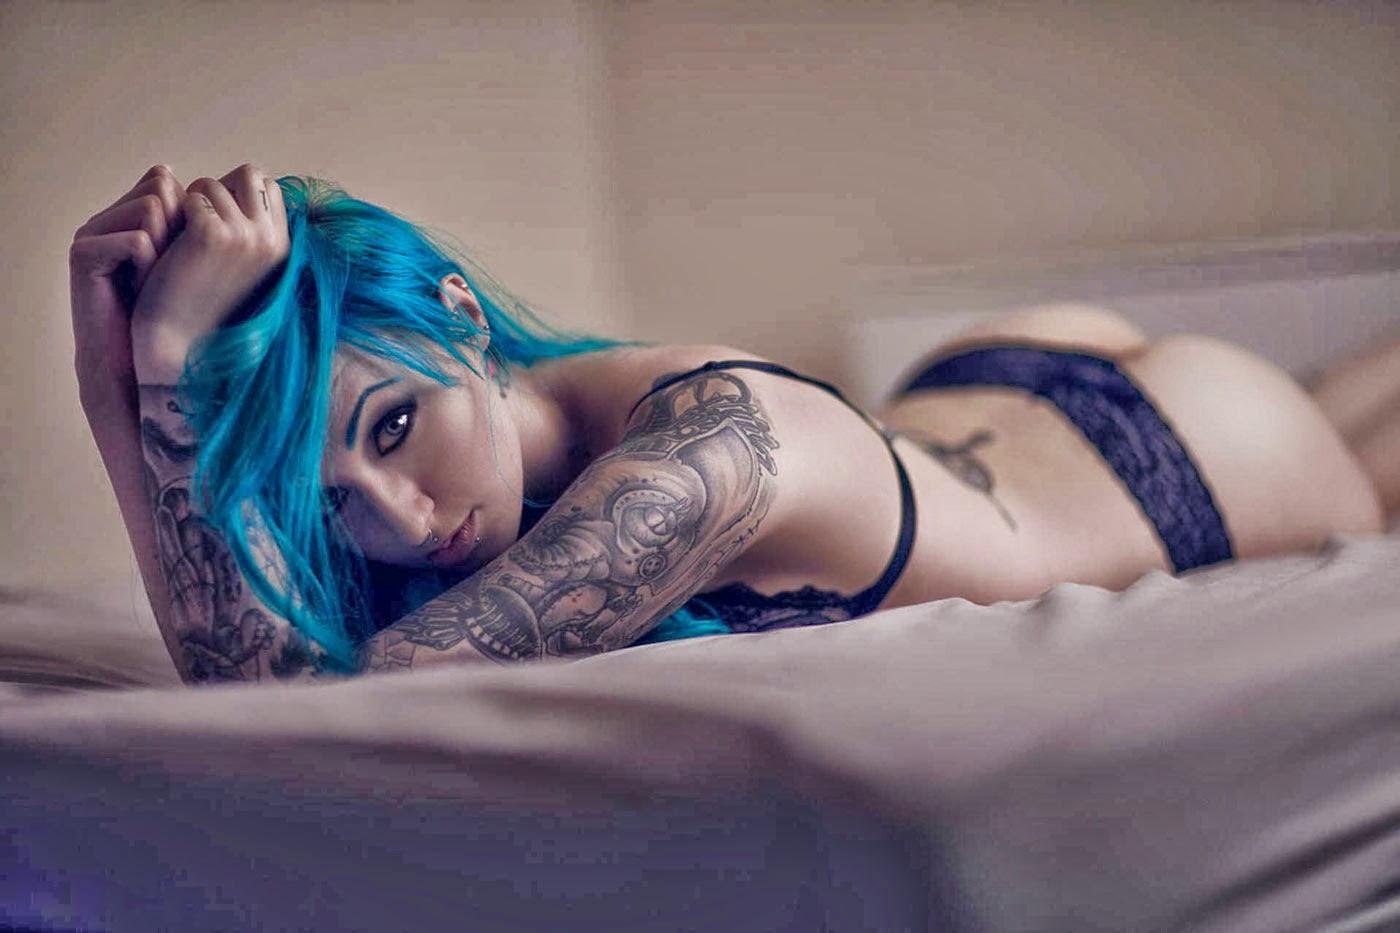 Tattoo Girl Wallpaper Sf Wallpaper